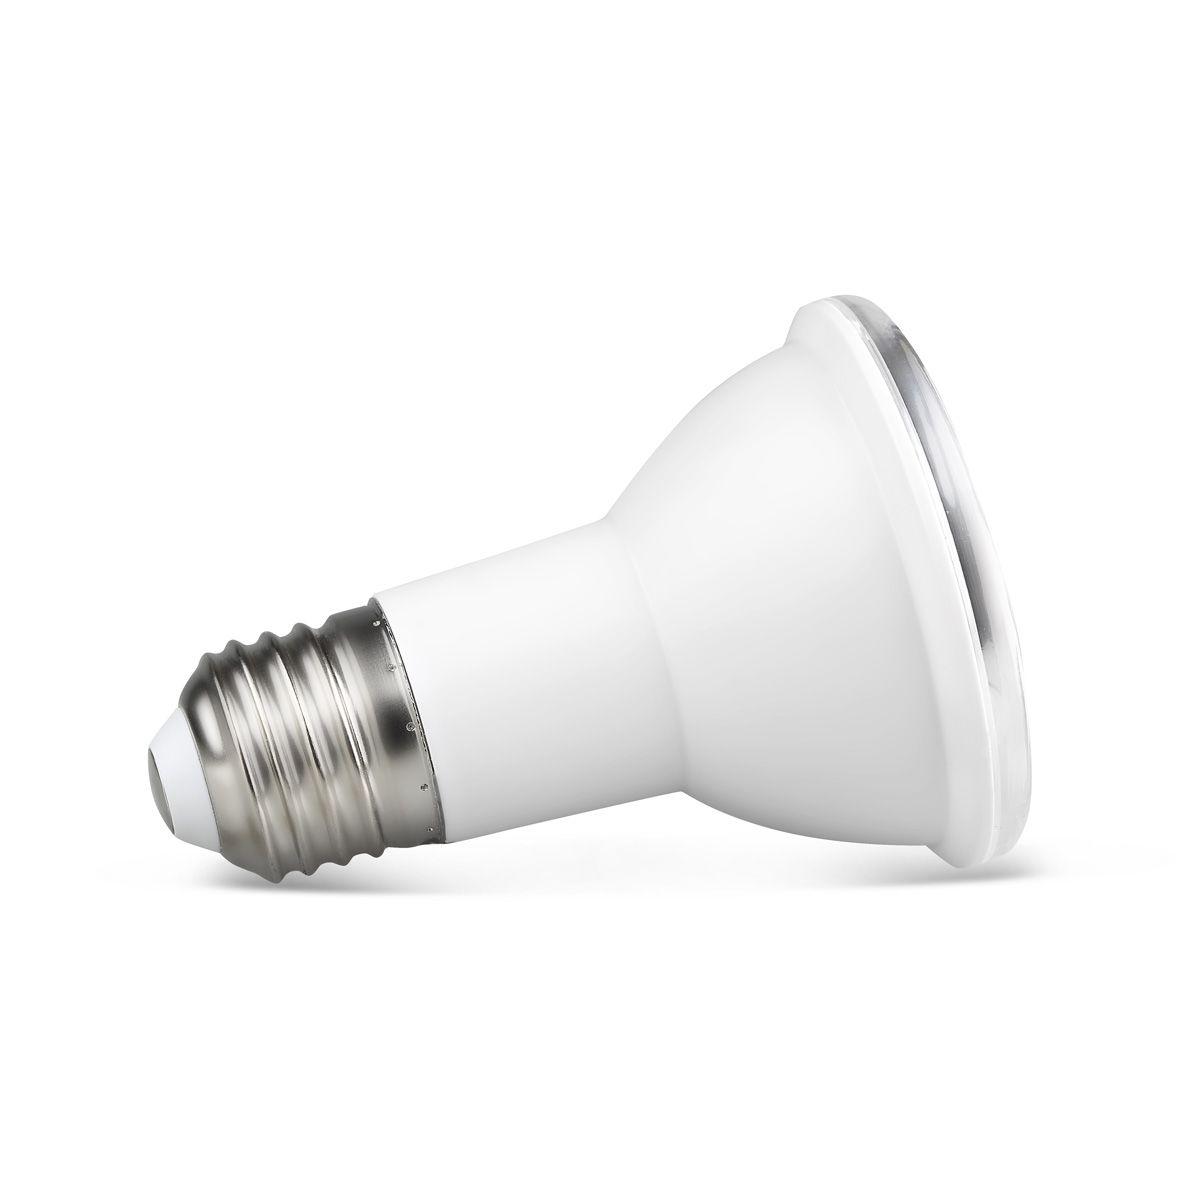 Kit 04x Spot Embutir Face Recuado + Lampada Par20 7w Luz Neutra 4000k